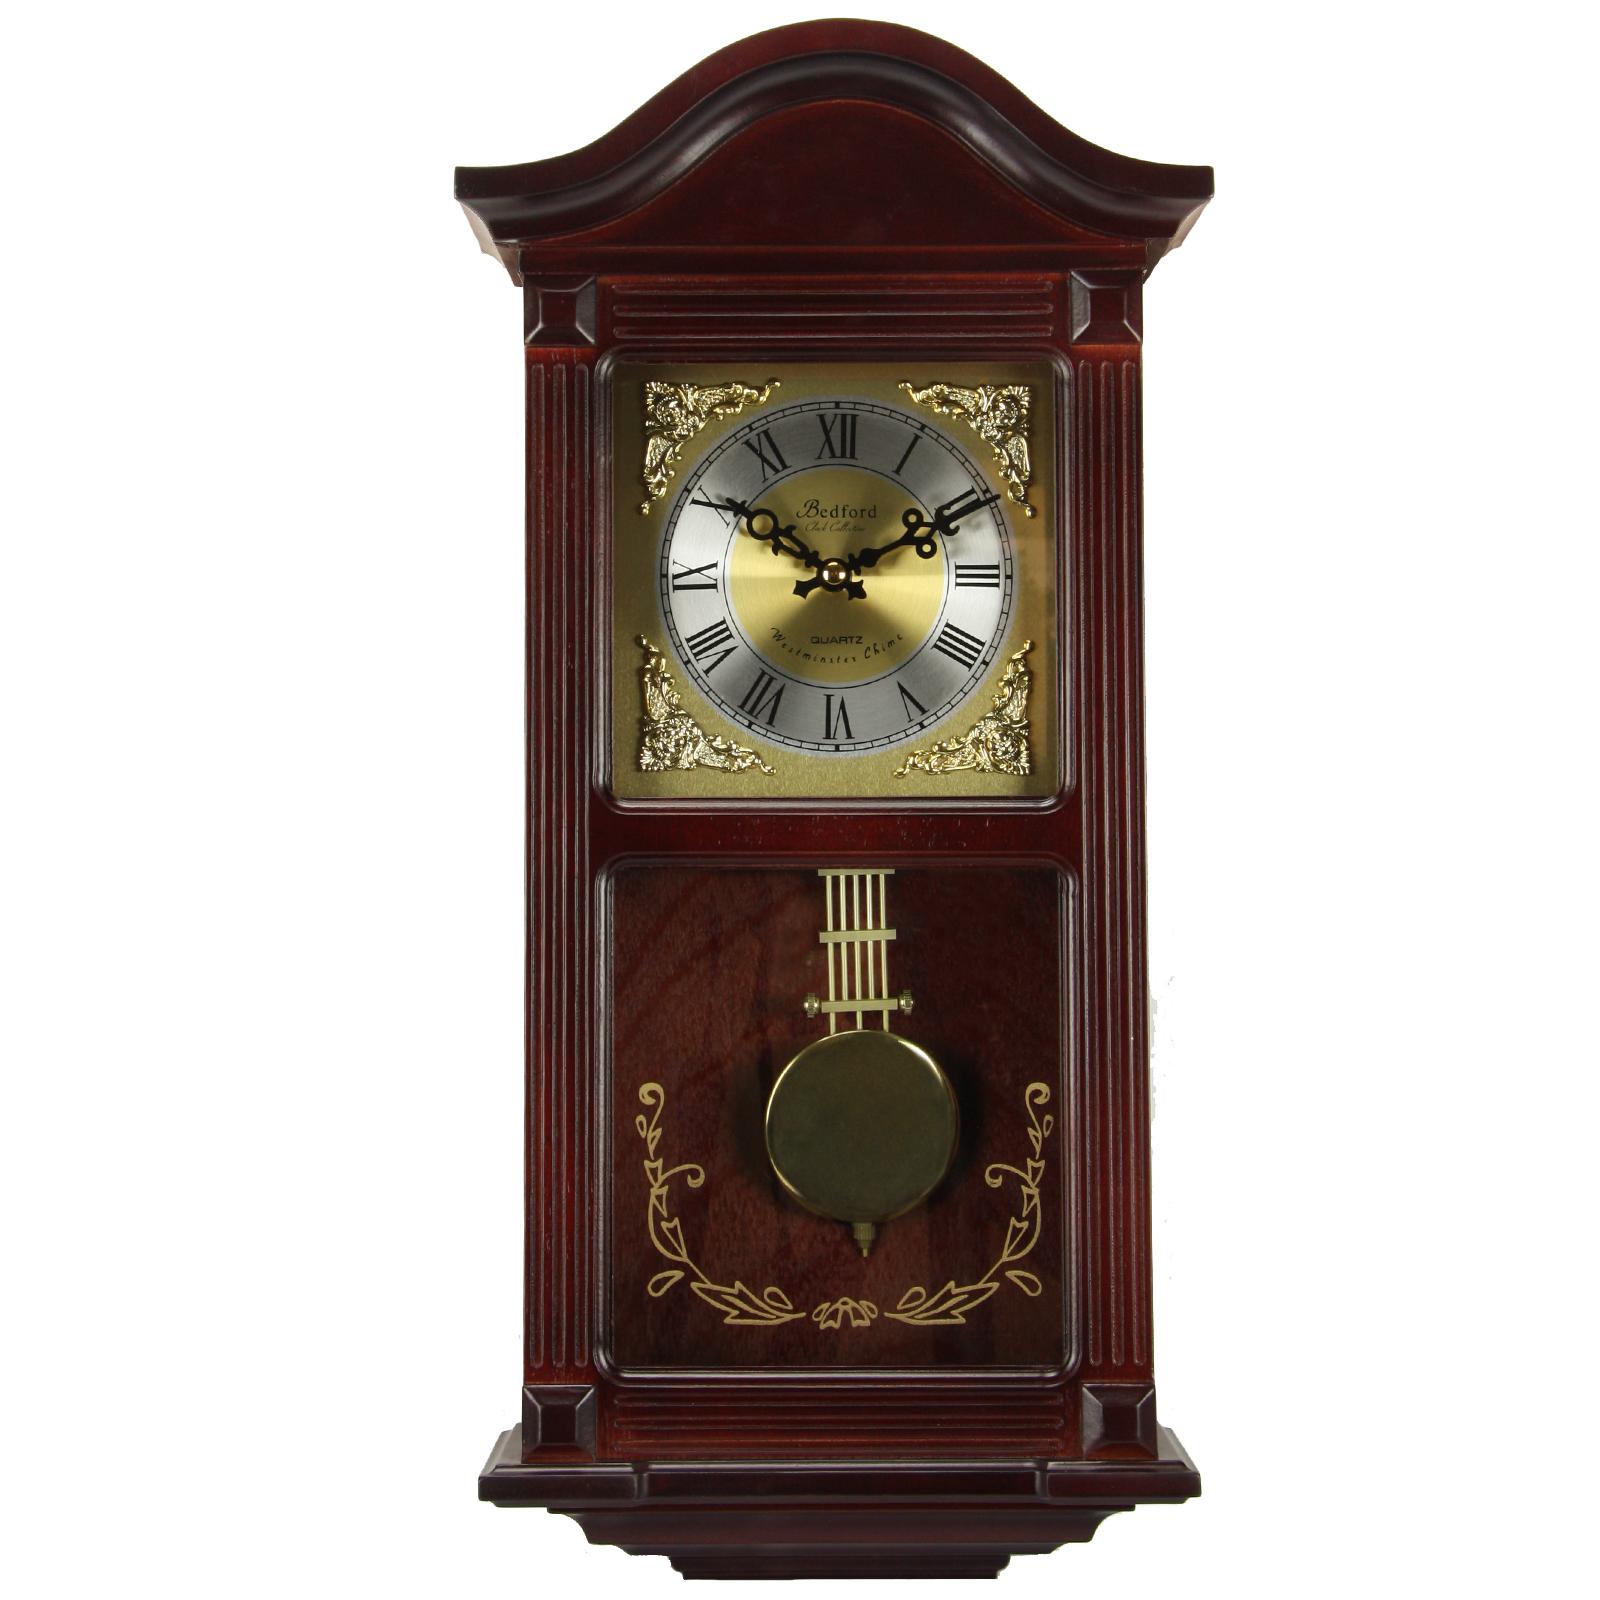 Bedford Colección reloj de madera de cerezo caoba 22\